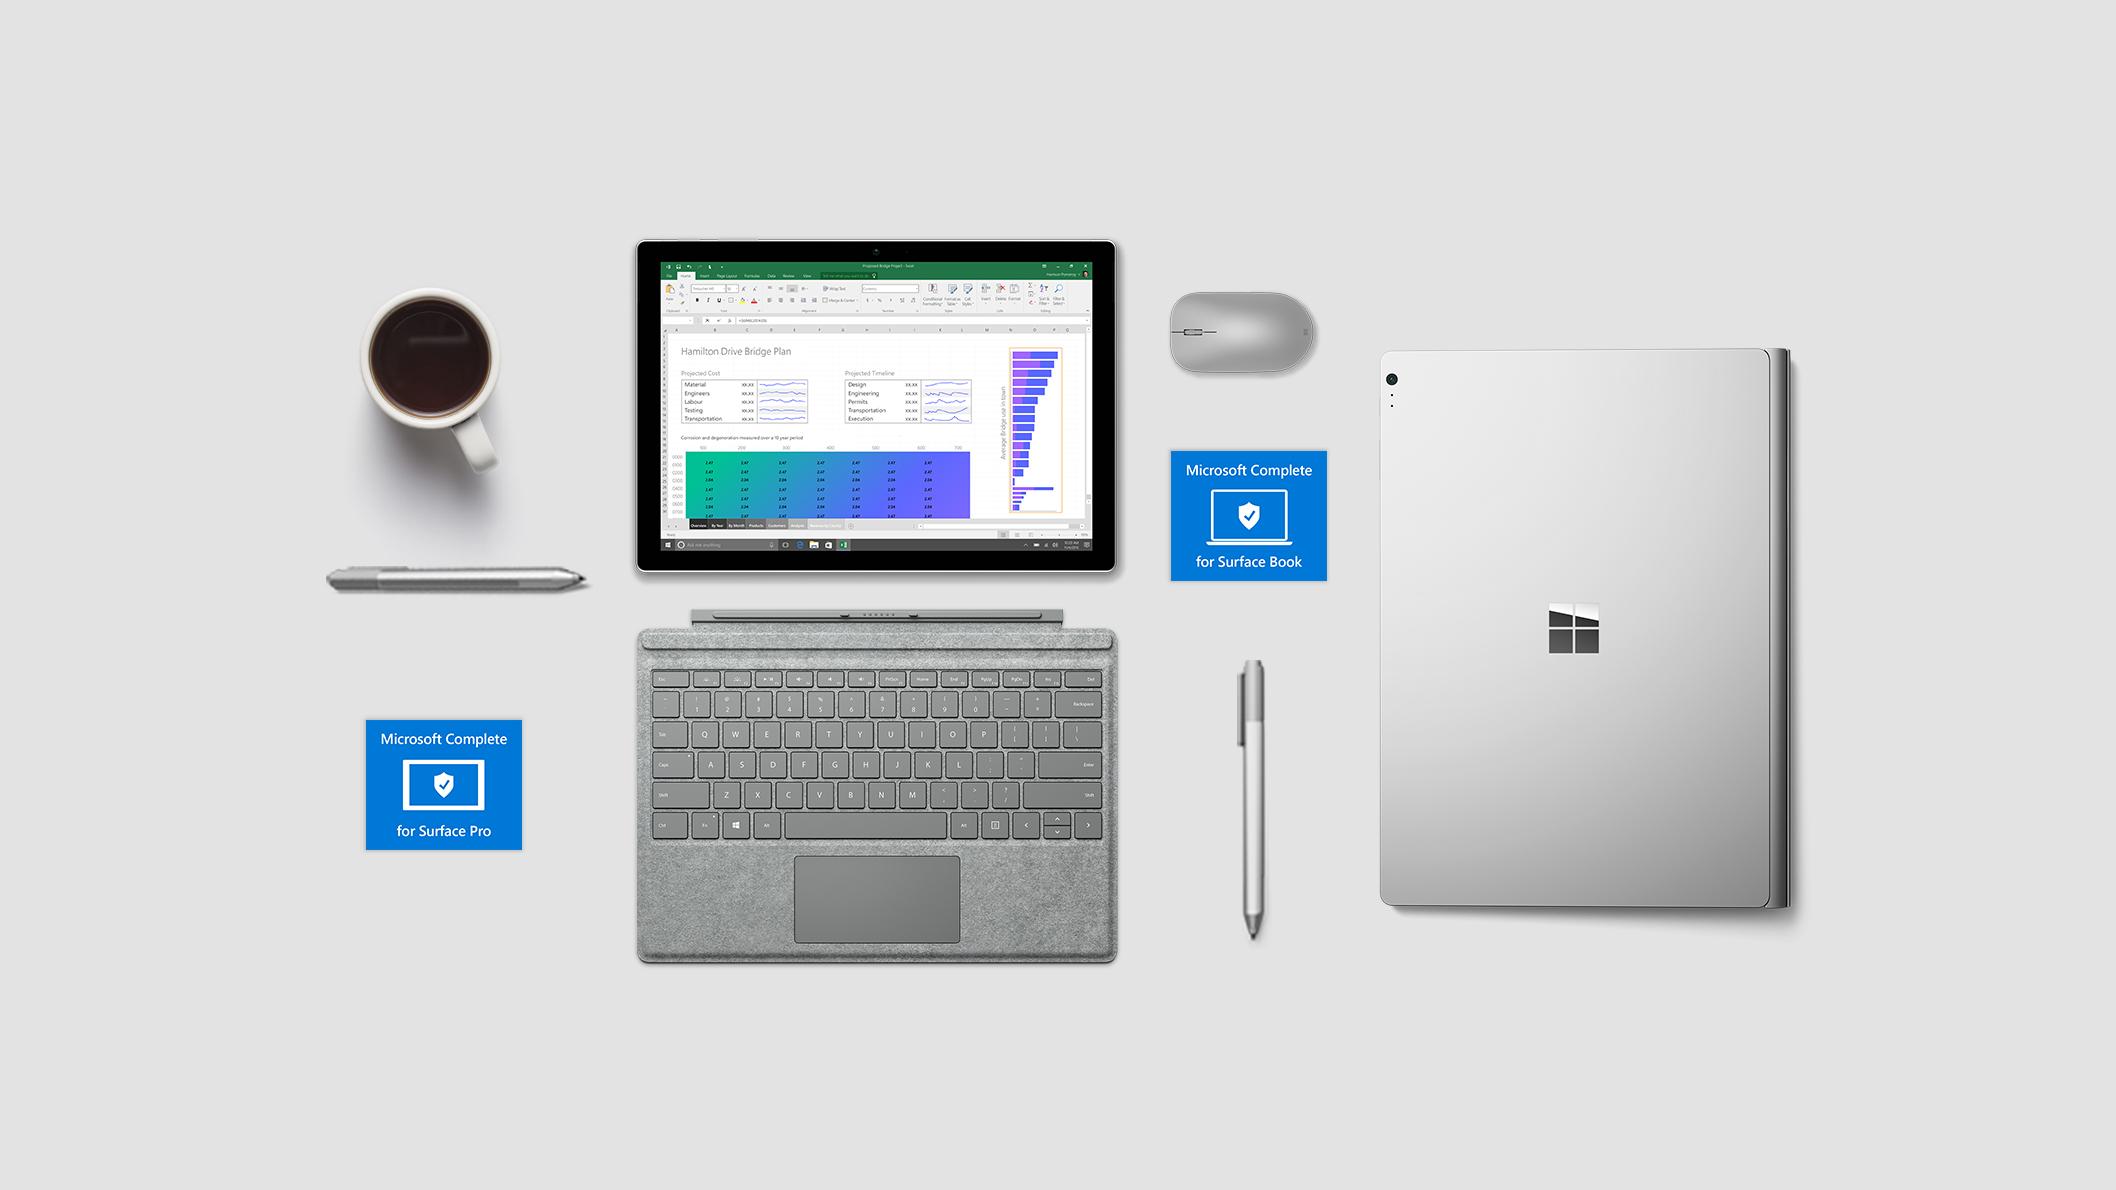 Appareils Surface et Microsoft Complete